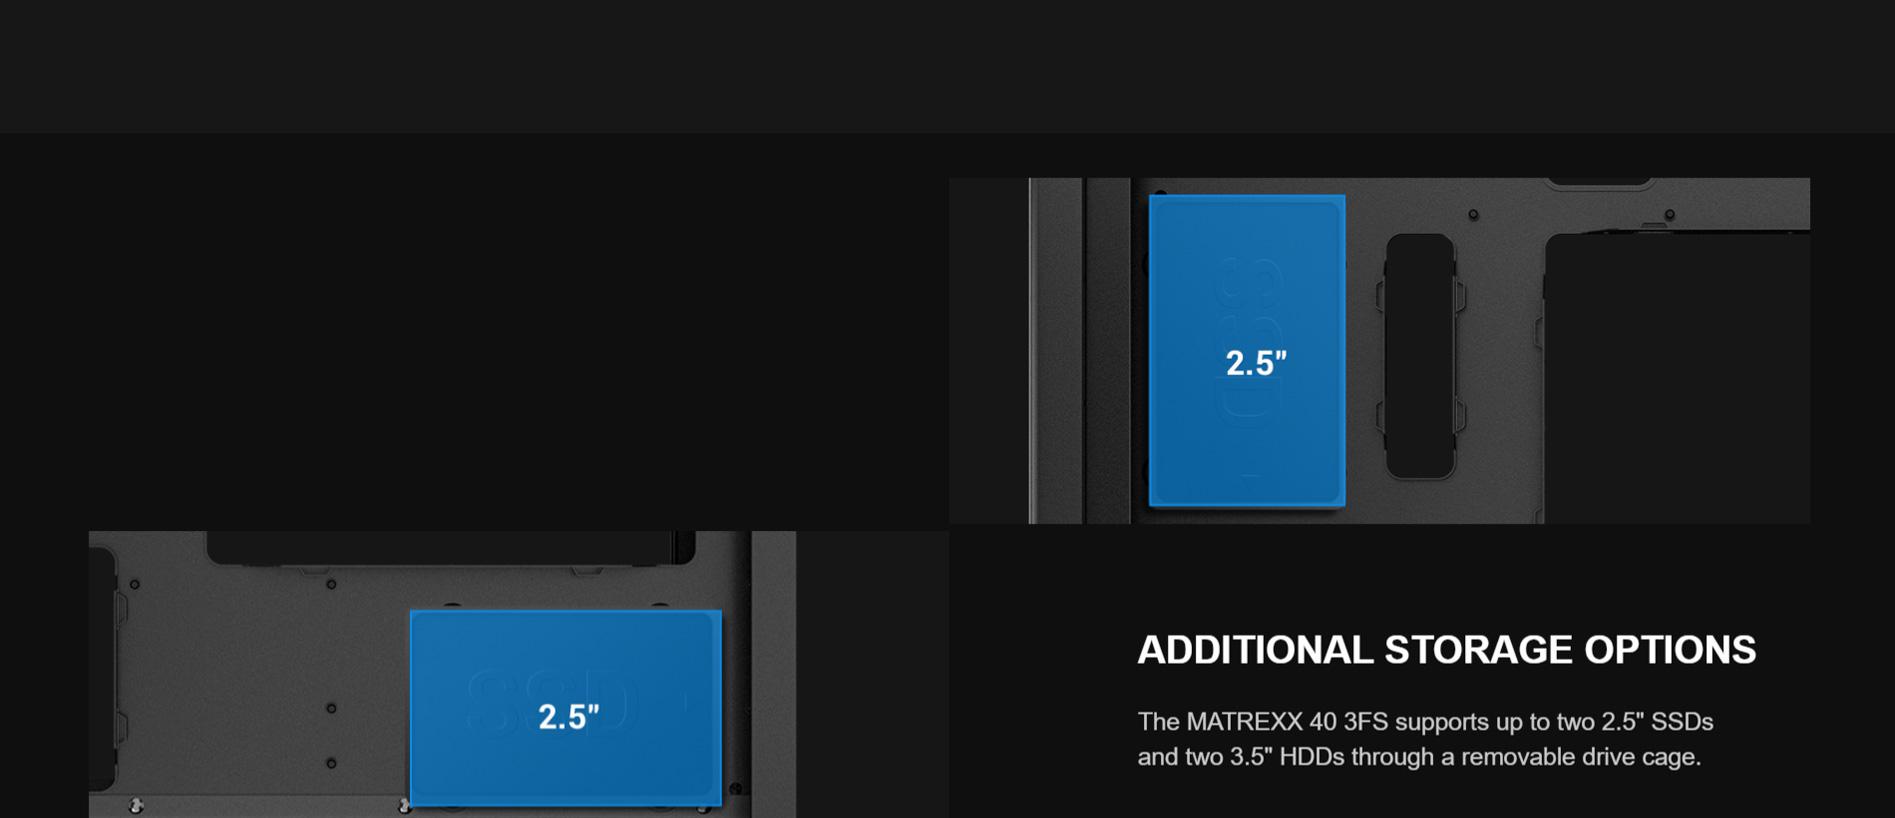 Deepcool Matrexx 40 3FS Tri Color LED Cabinet (Black)